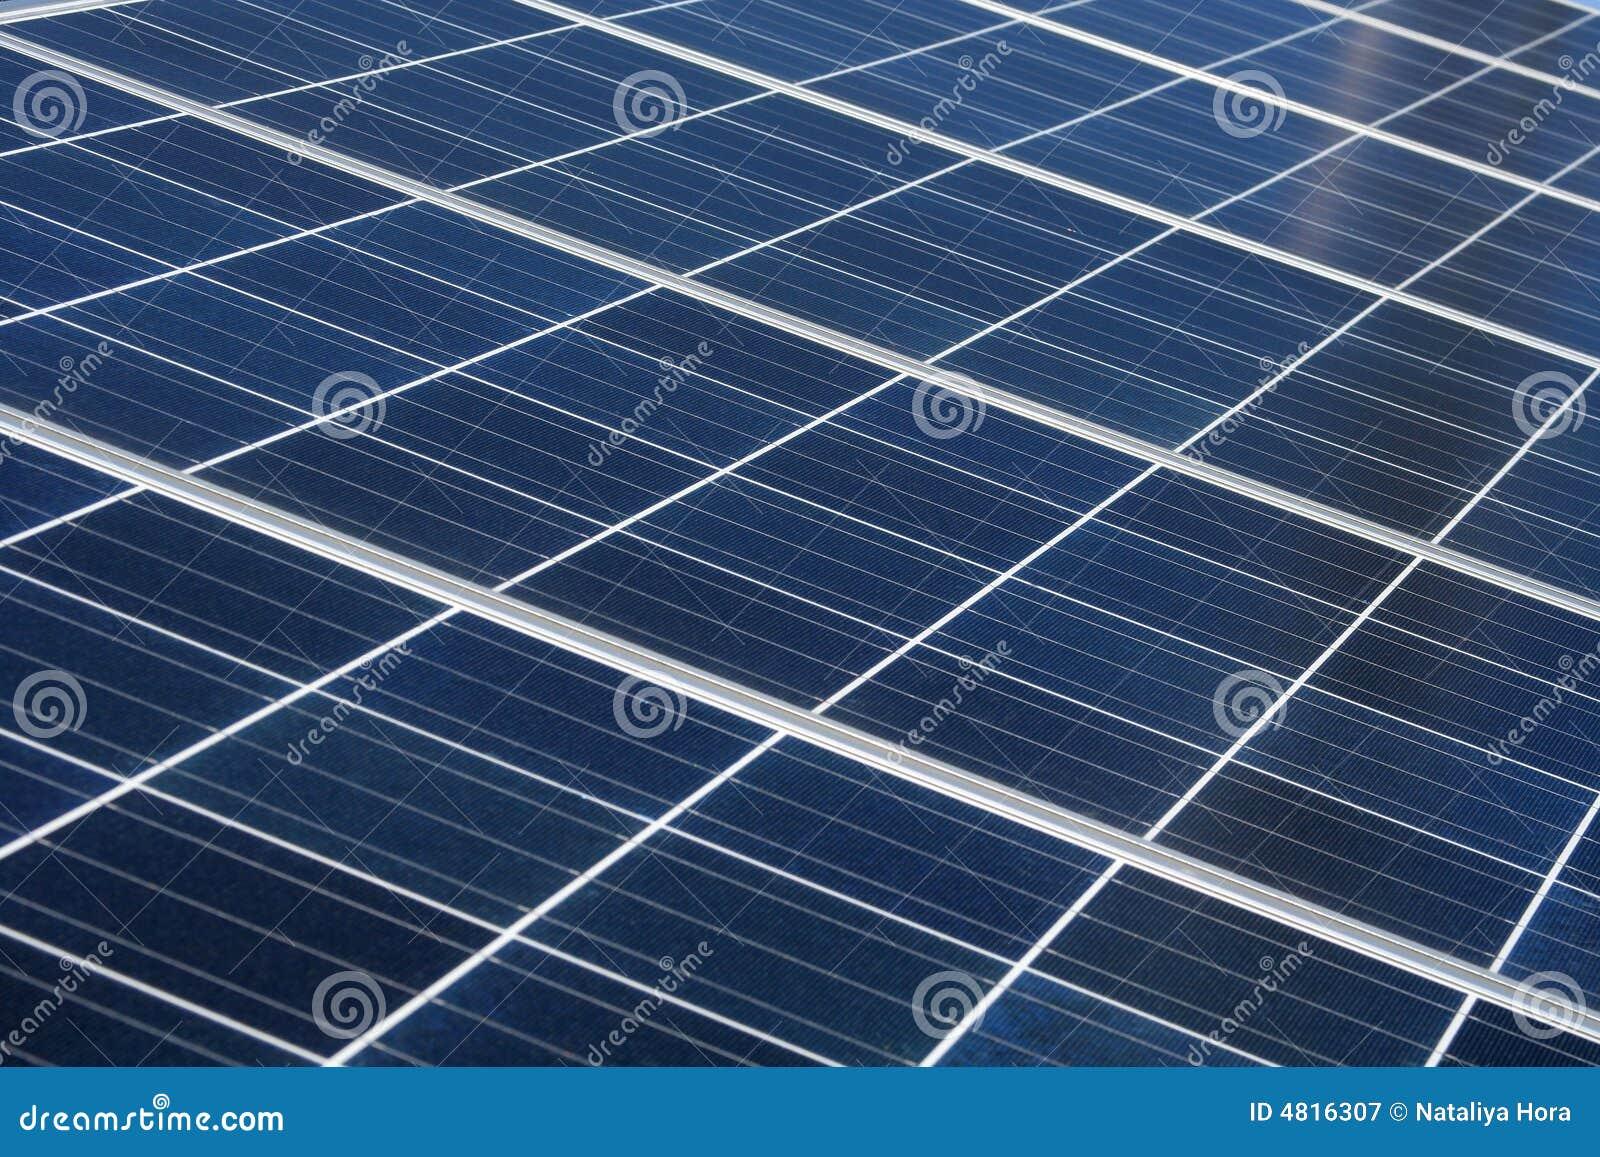 solar panel background - photo #36